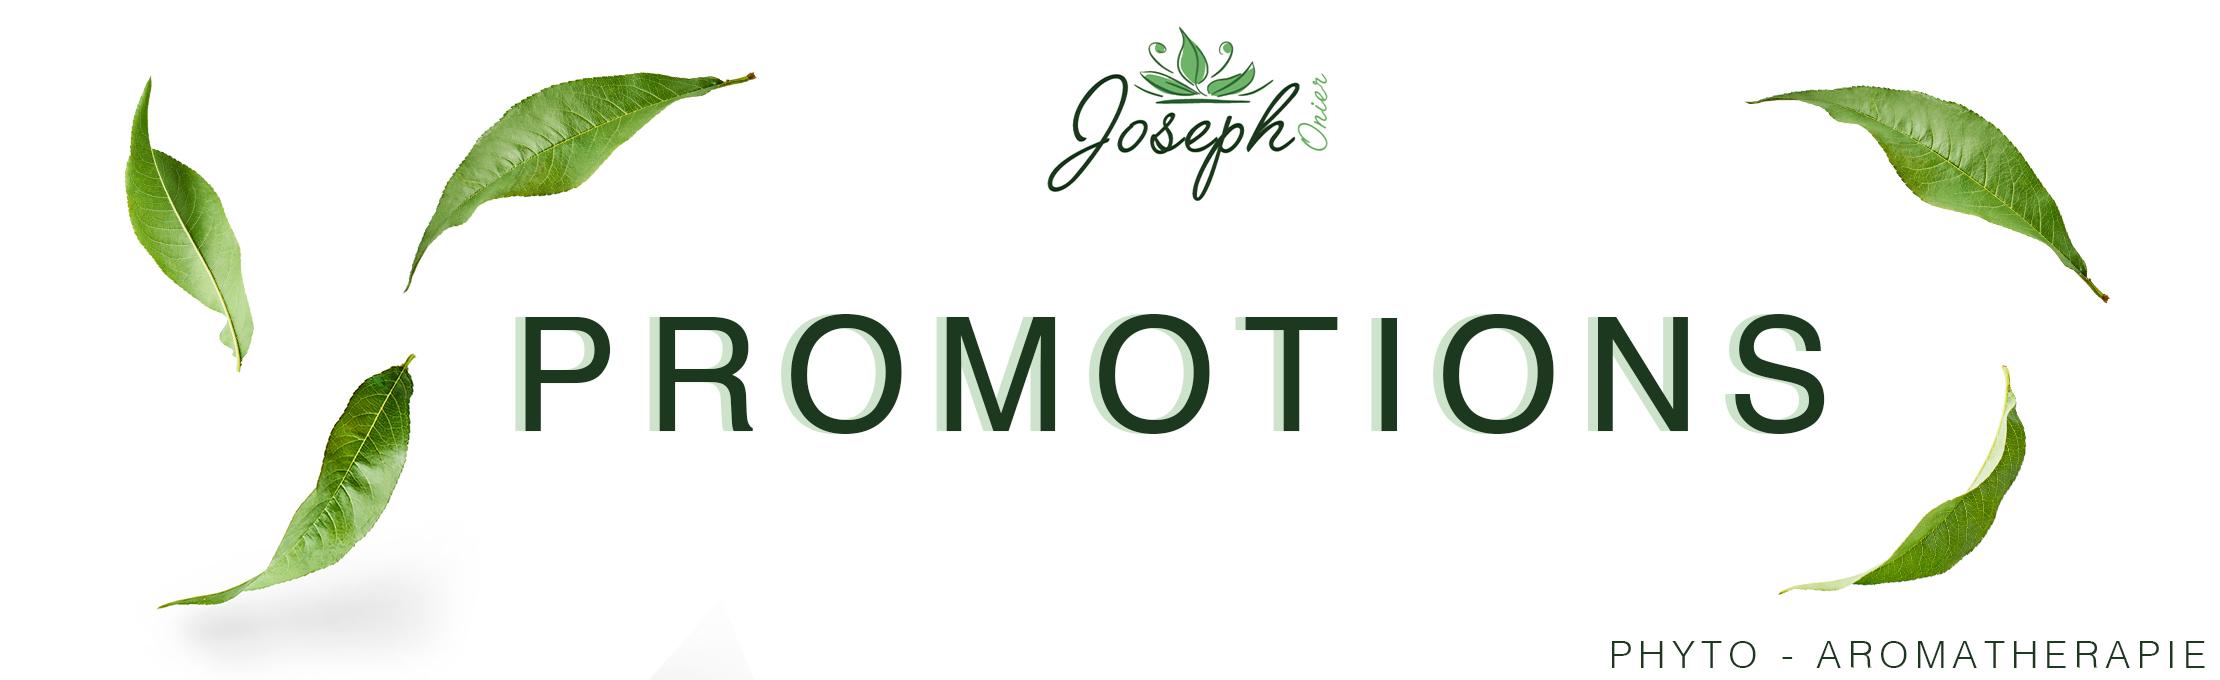 Promotions Joseph ONIER